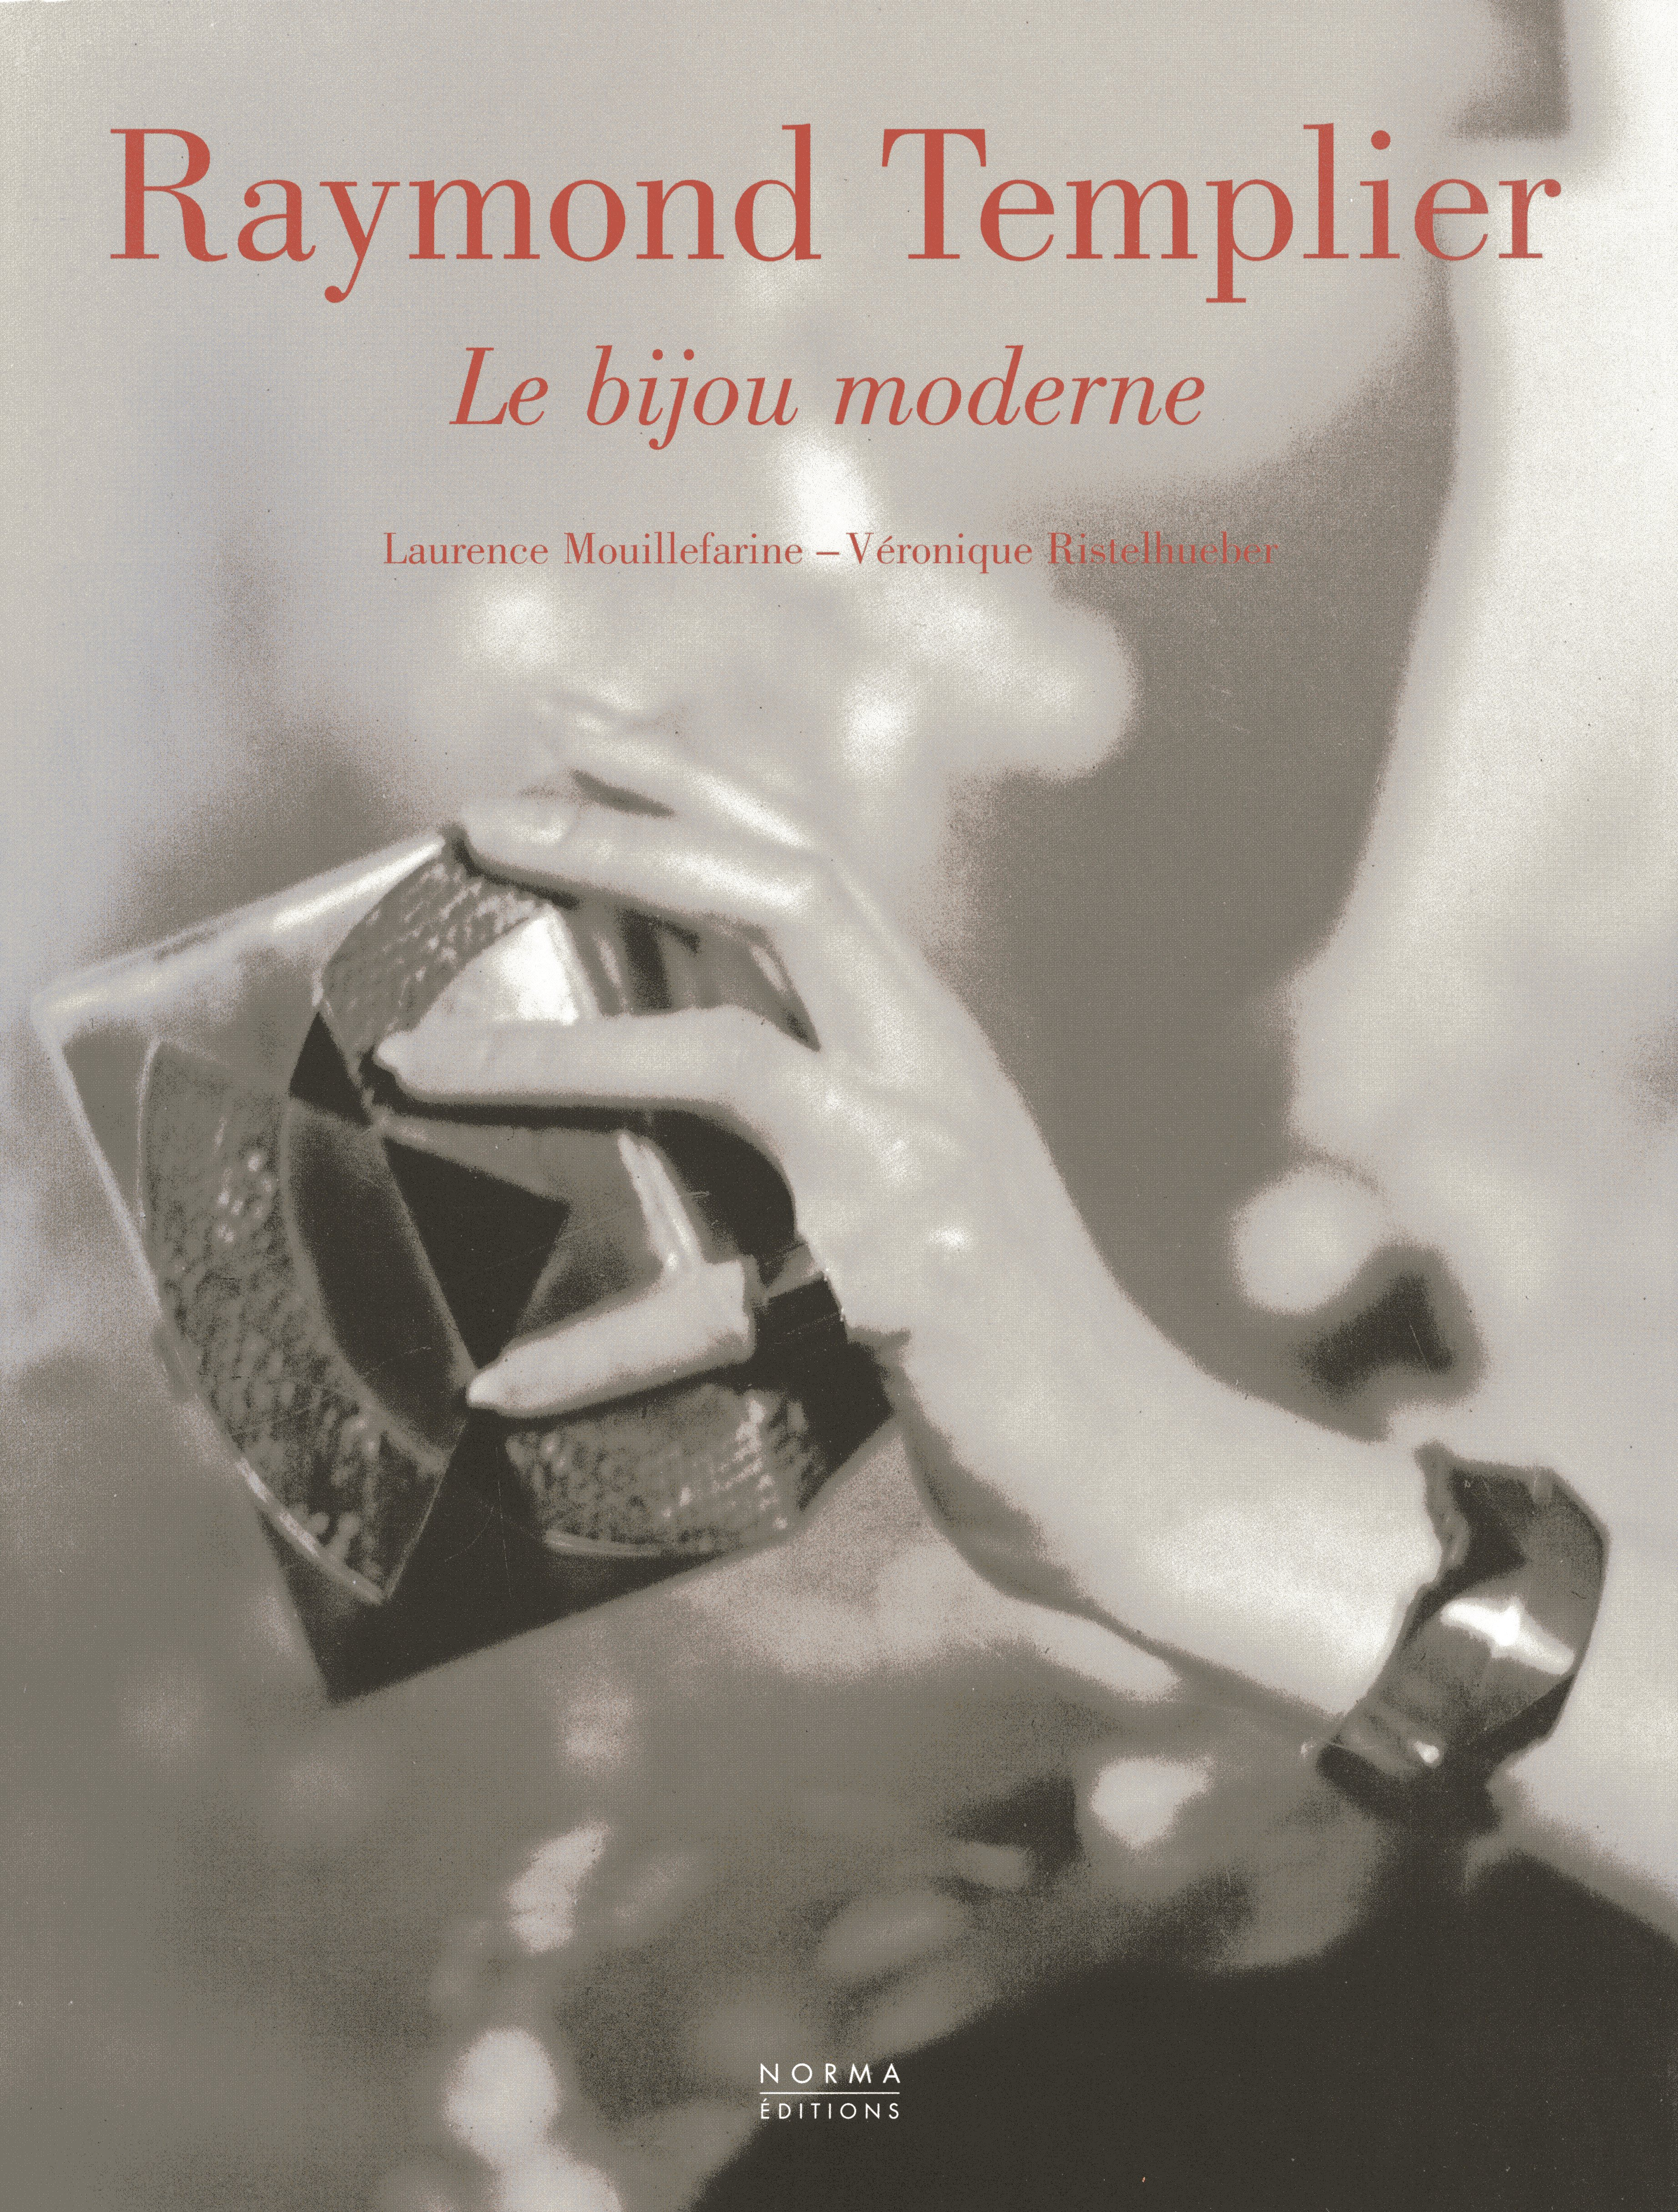 Fine-art books and old books bookshop Lardanchet Paris - Art books ... - Bijoux Moderne